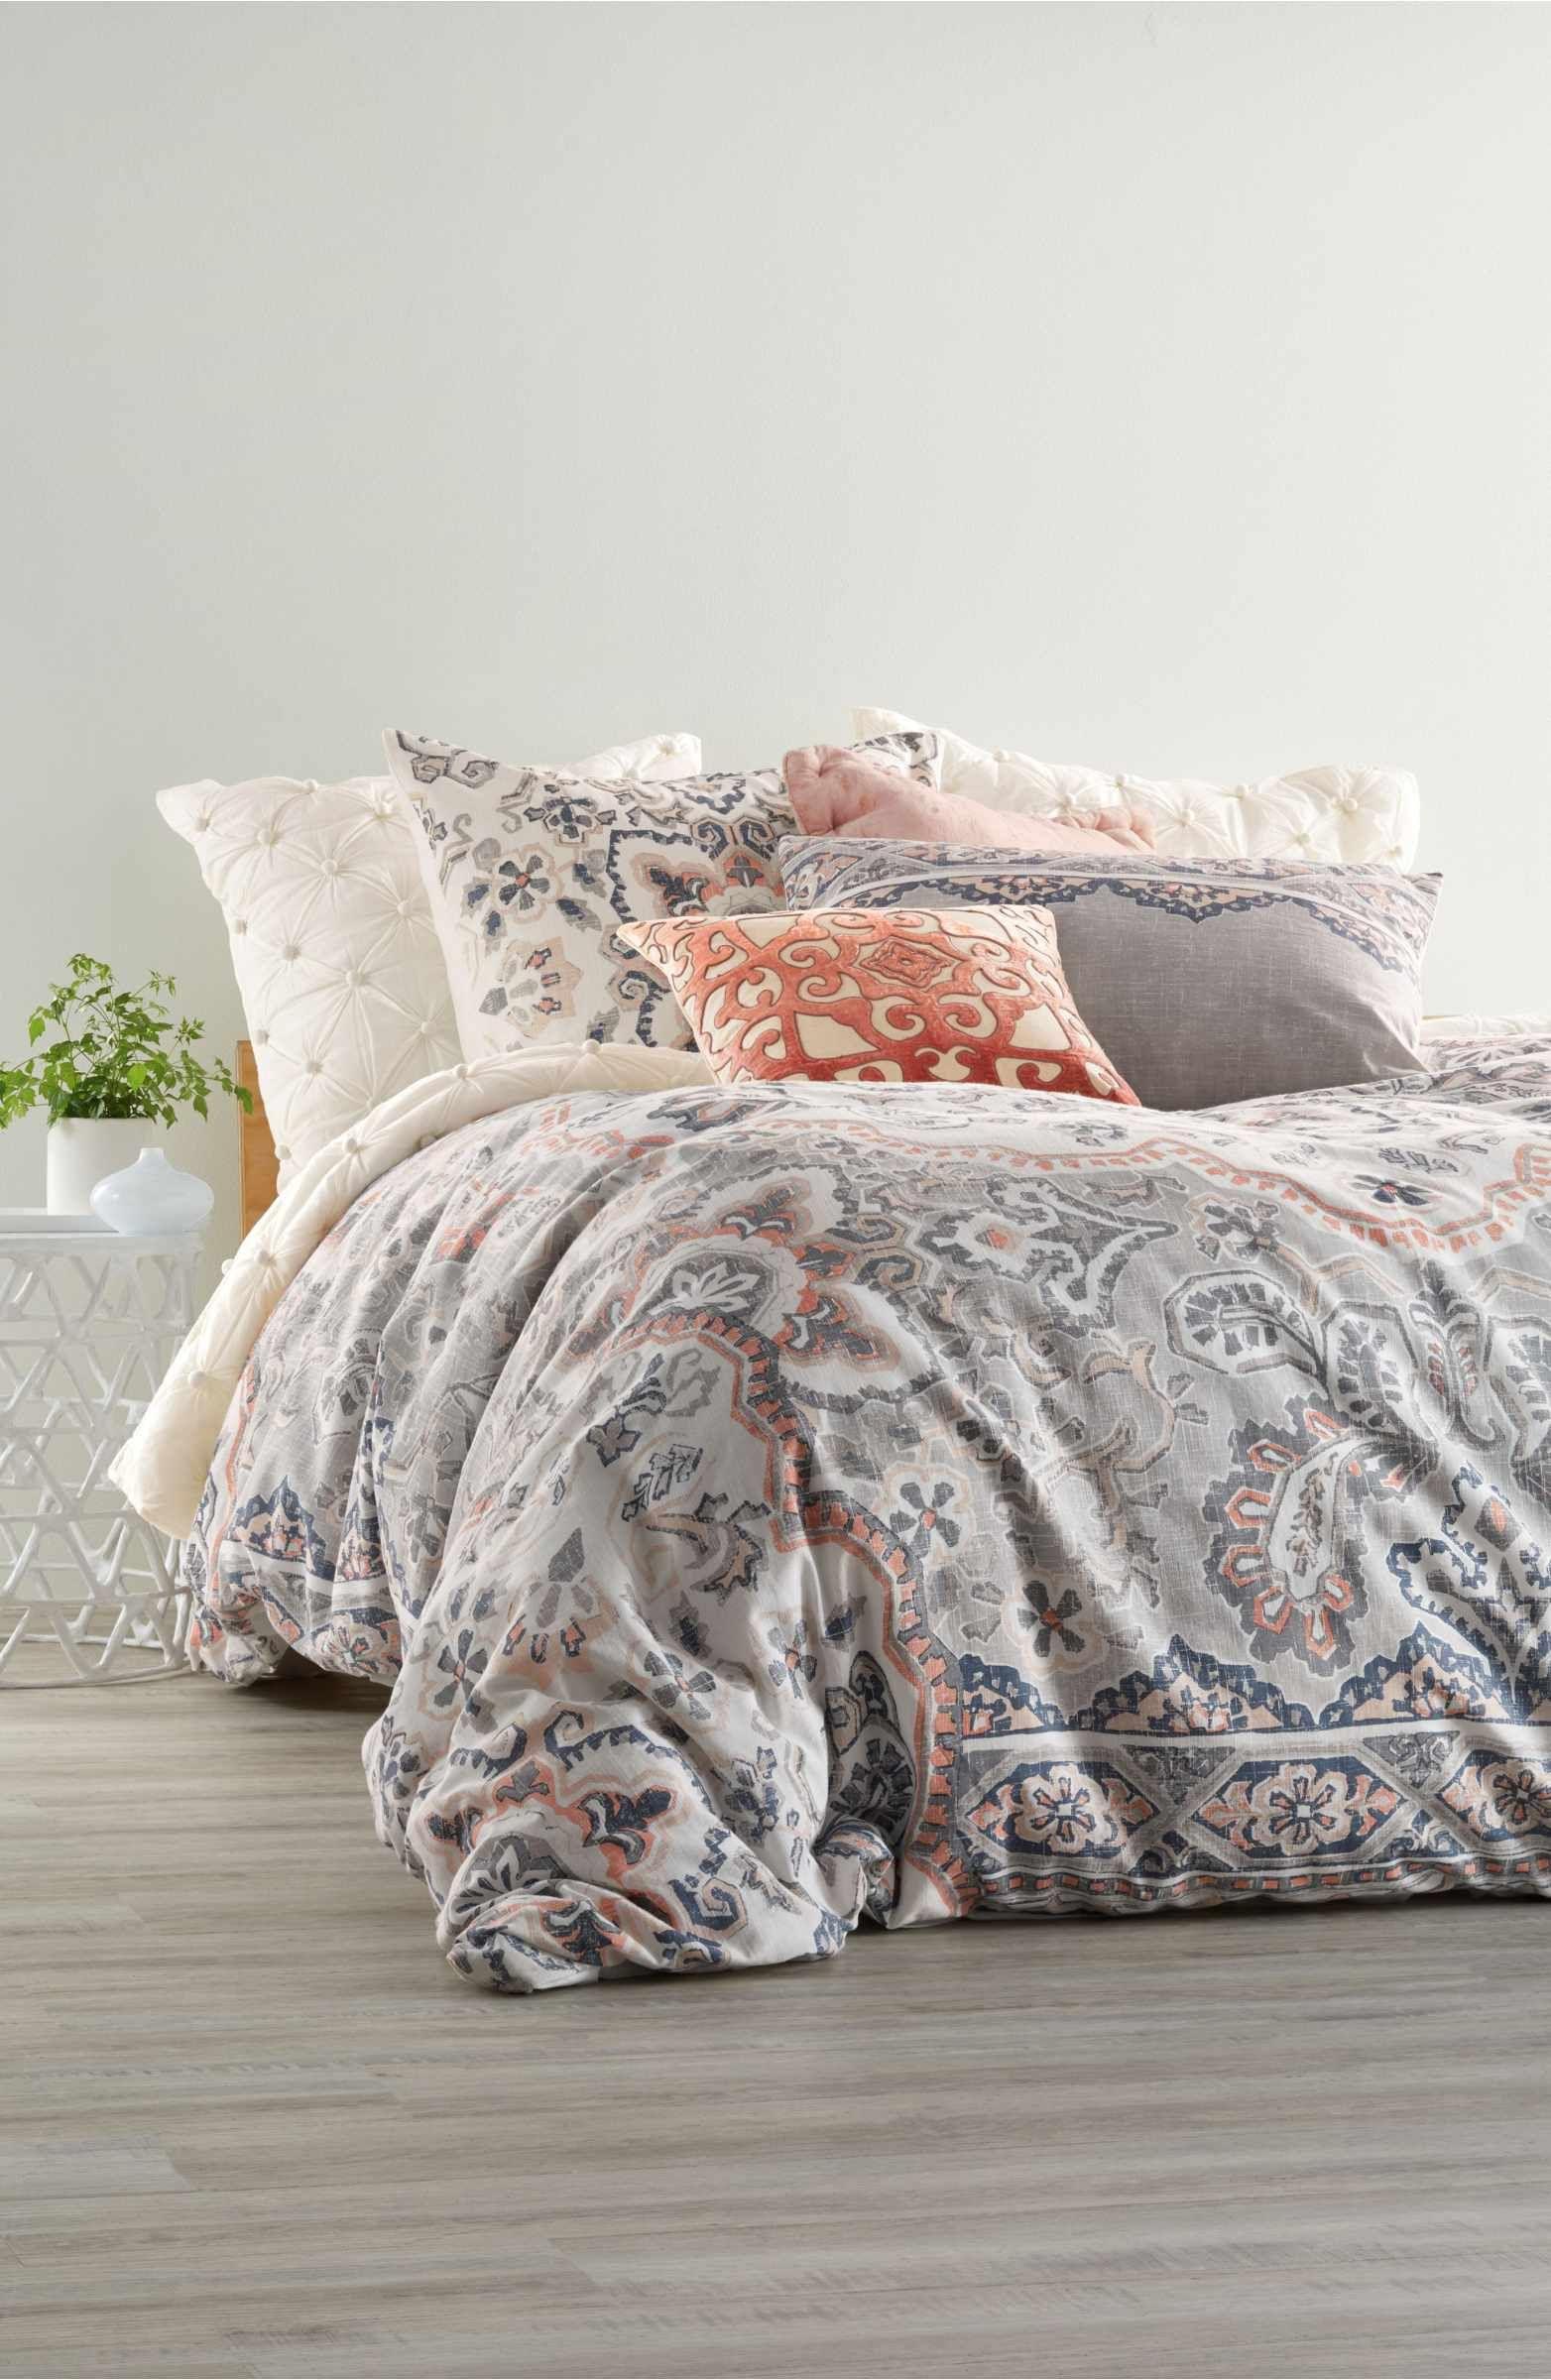 At Home Lilah Duvet Cover Bedroom Design Inspiration